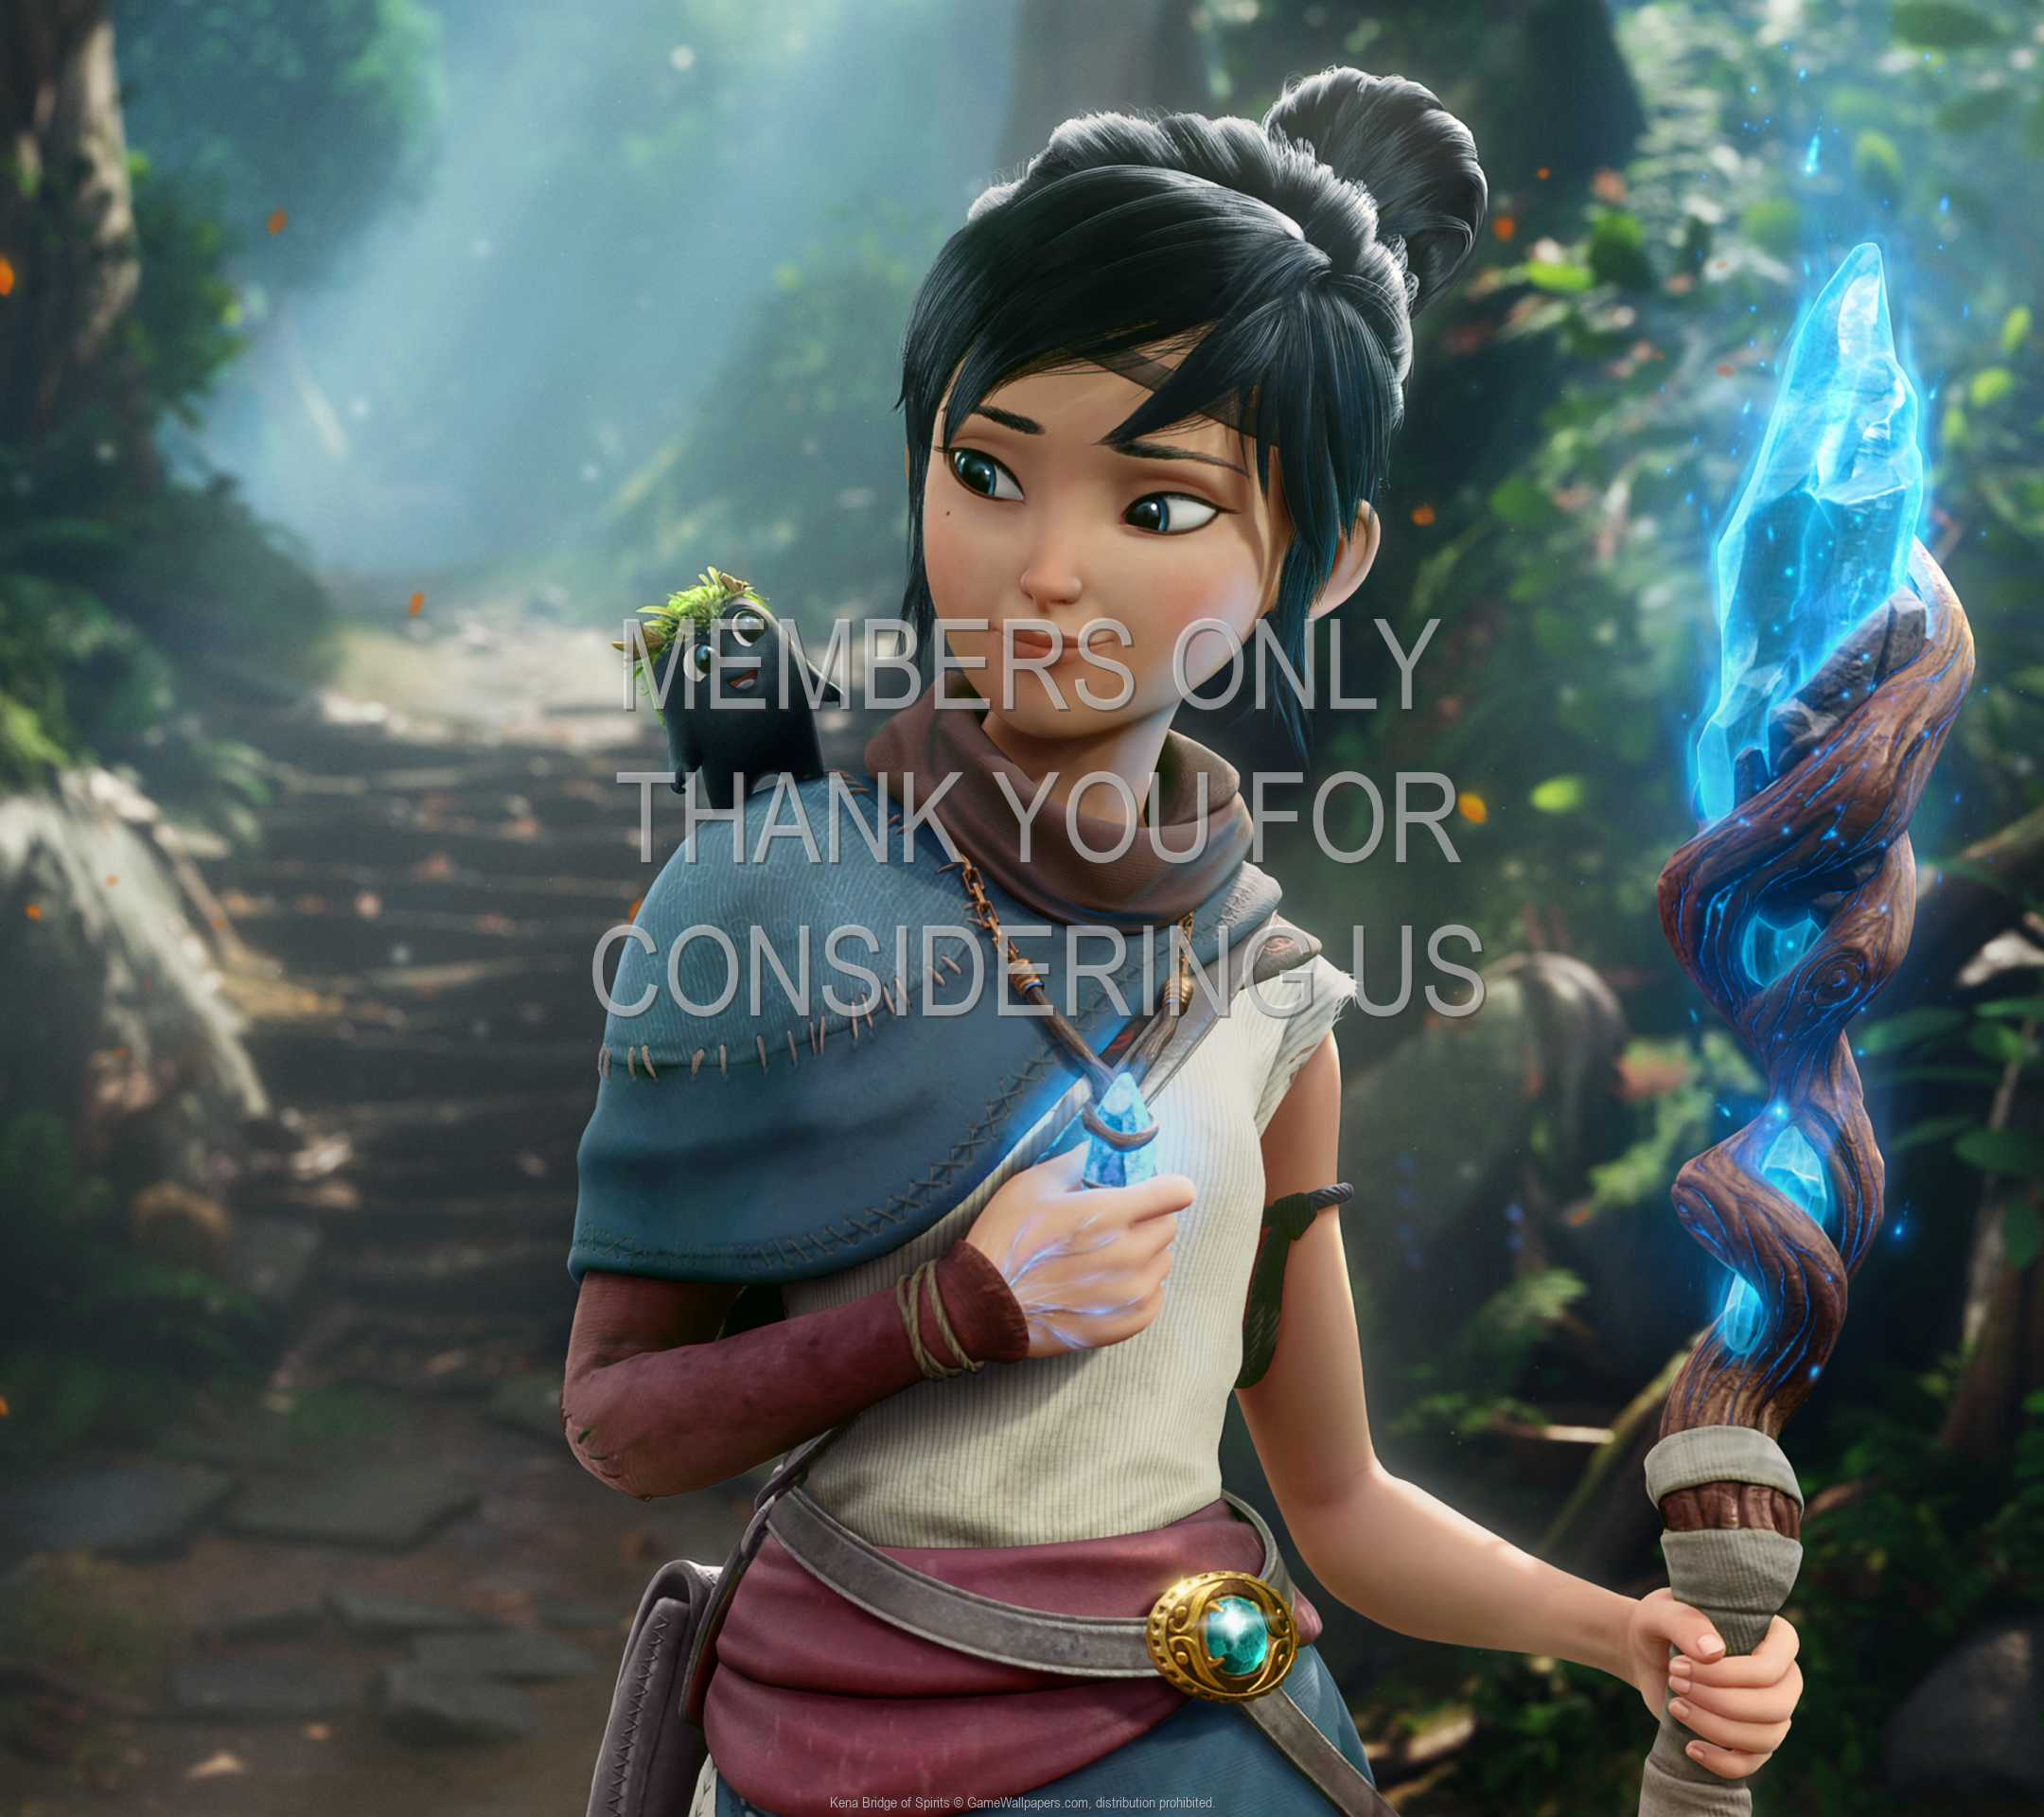 Kena: Bridge of Spirits 1080p Horizontal Mobile fond d'écran 03